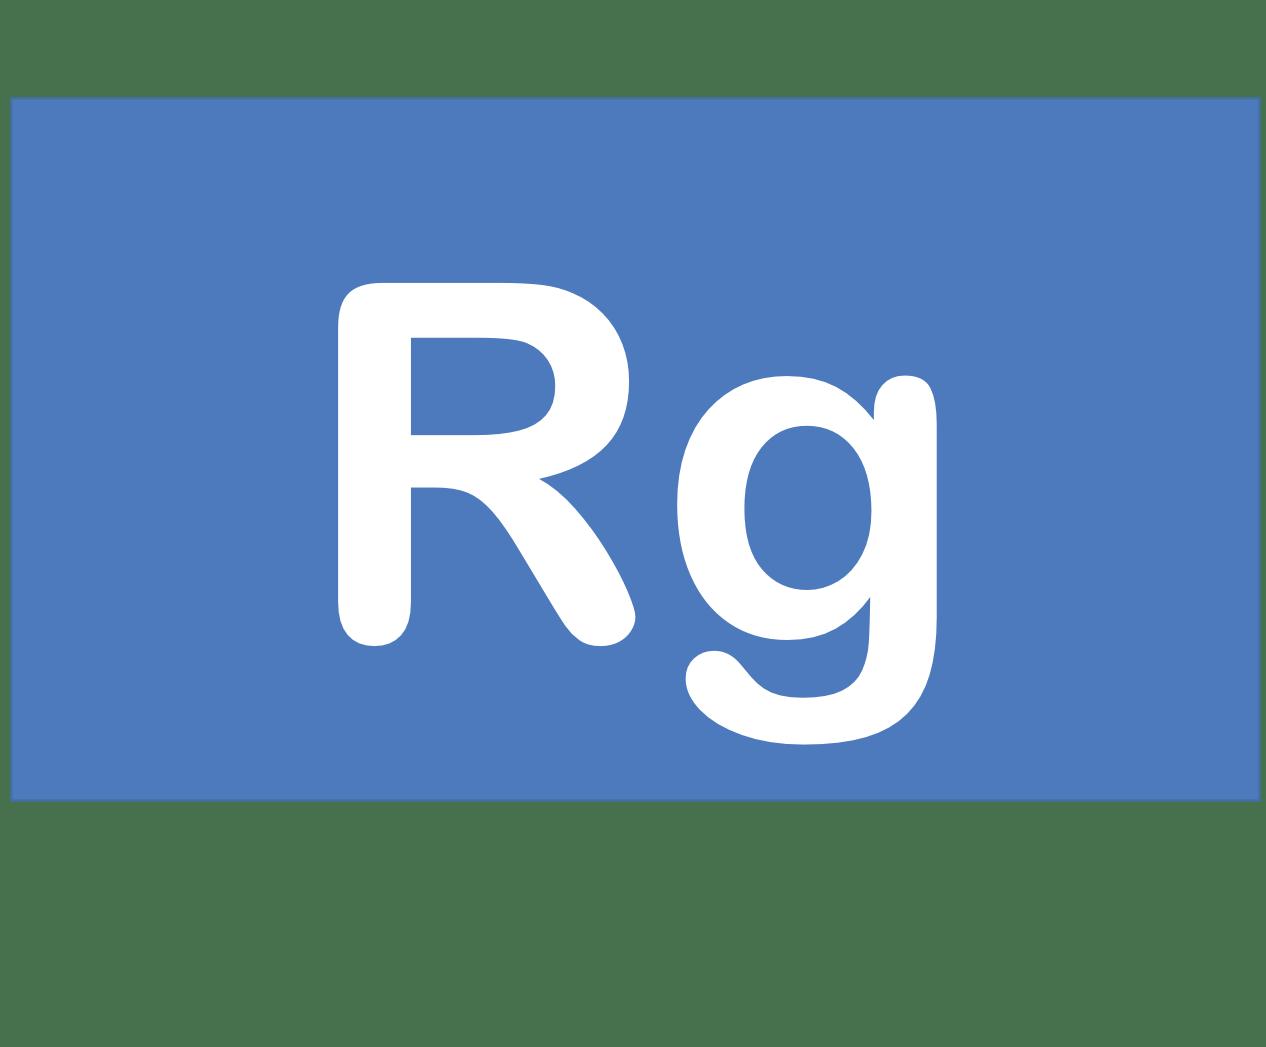 111 Rg レントゲニウム Roentgenium 元素 記号 周期表 化学 原子